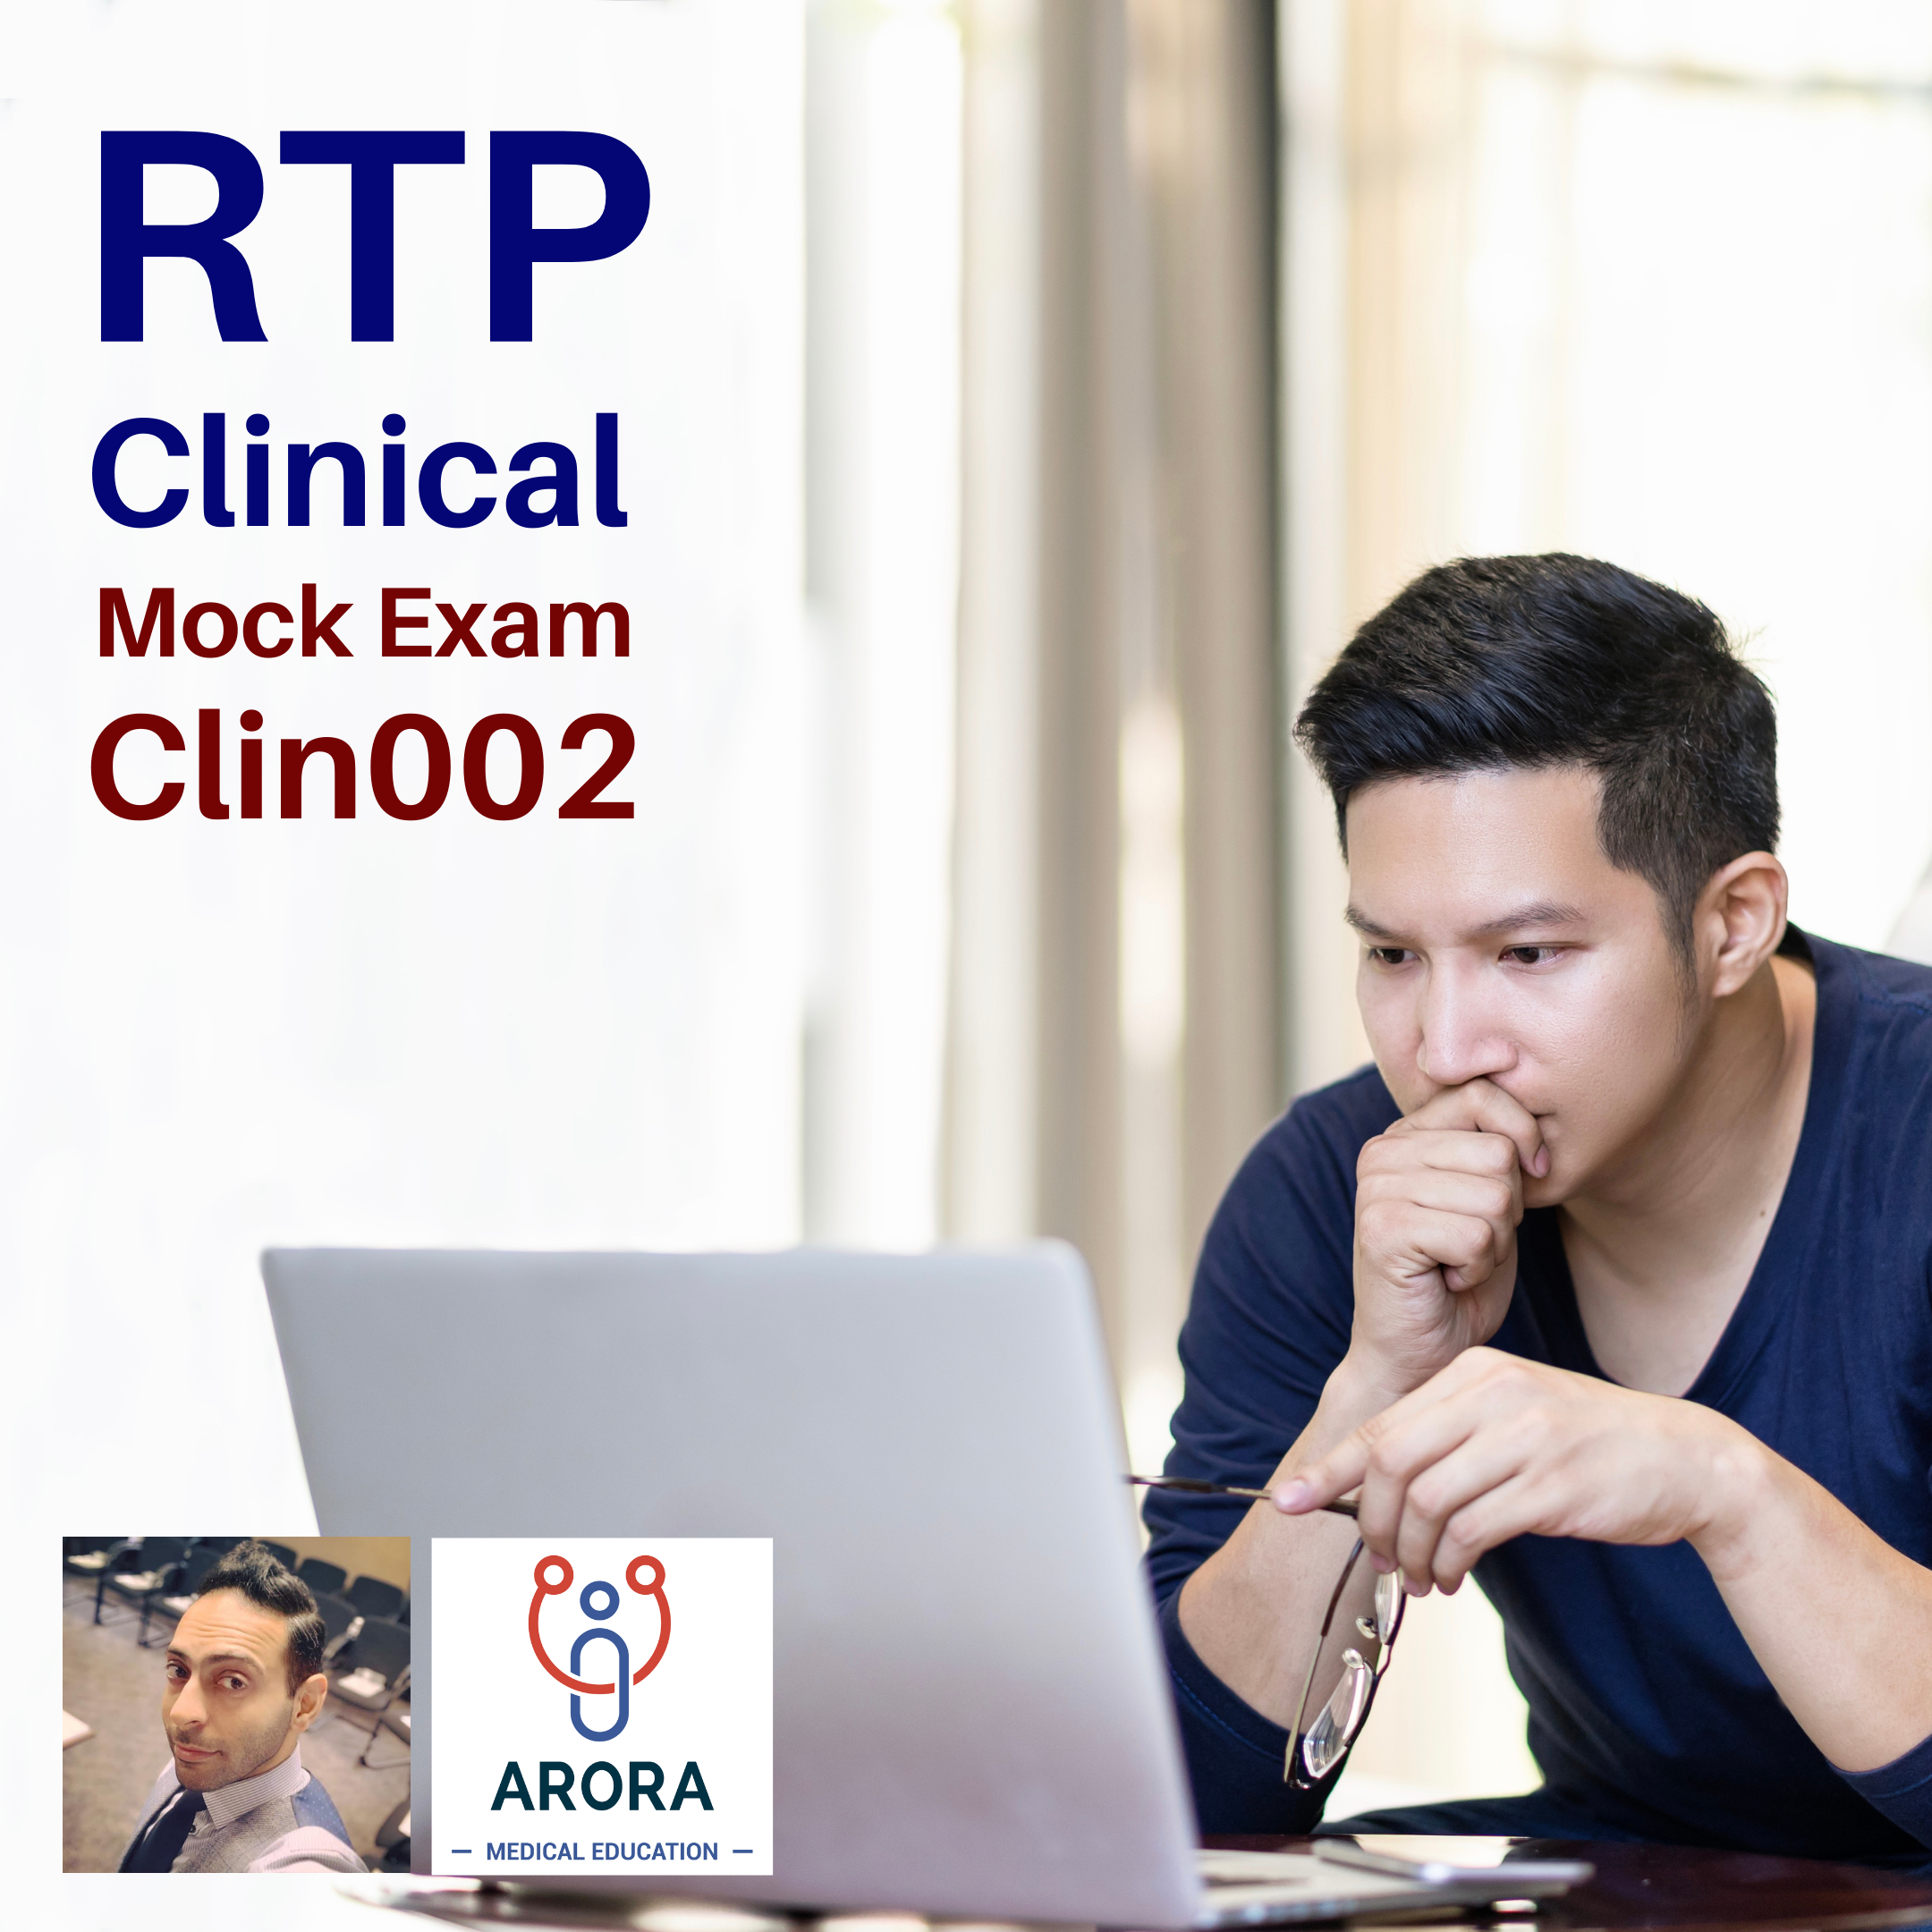 RTP Clin 002 - MRCGP CSA, AKT and PLAB Exam Courses and Online Webinars - Arora Medical Education